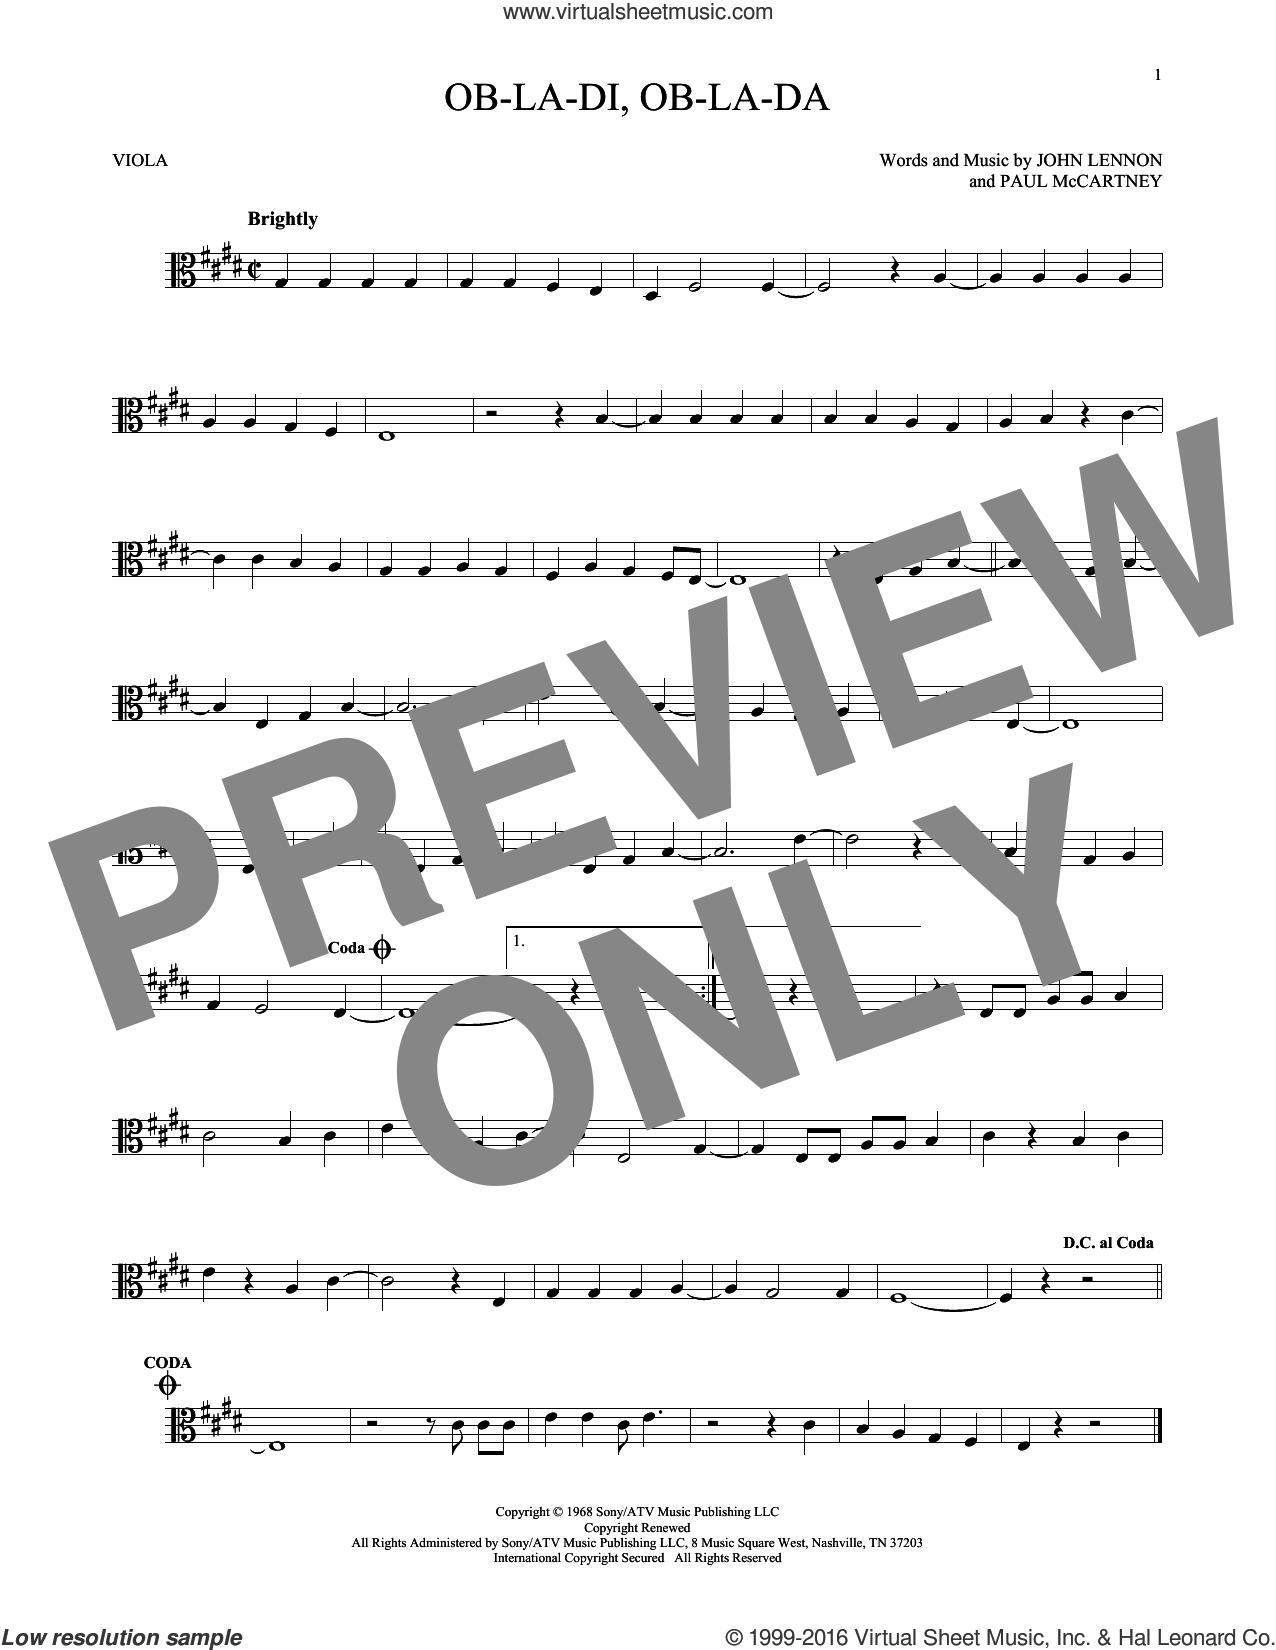 Ob-La-Di, Ob-La-Da sheet music for viola solo by The Beatles, John Lennon and Paul McCartney, intermediate skill level